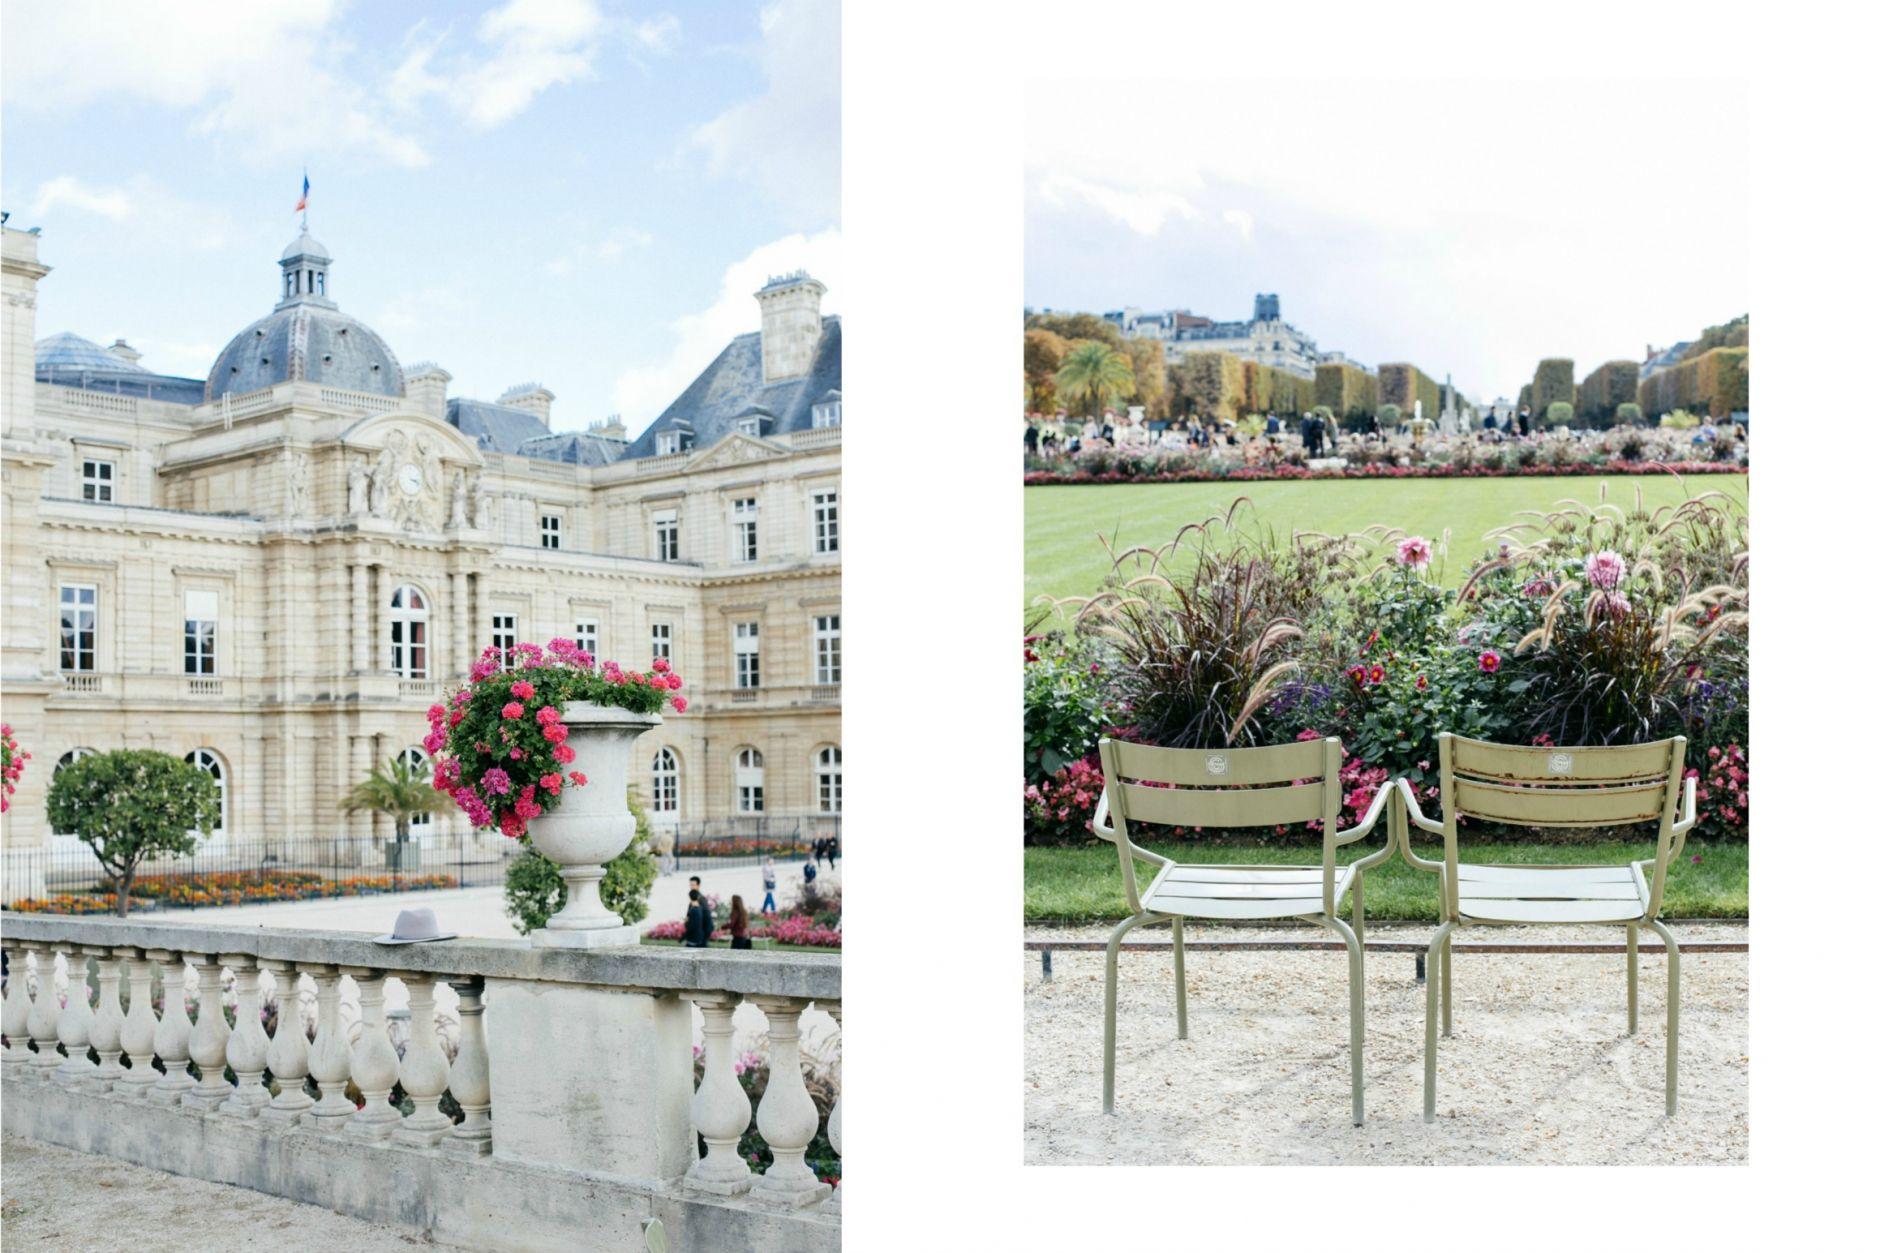 jardin-du-luxembourg-paris-fashion-week-france-3000